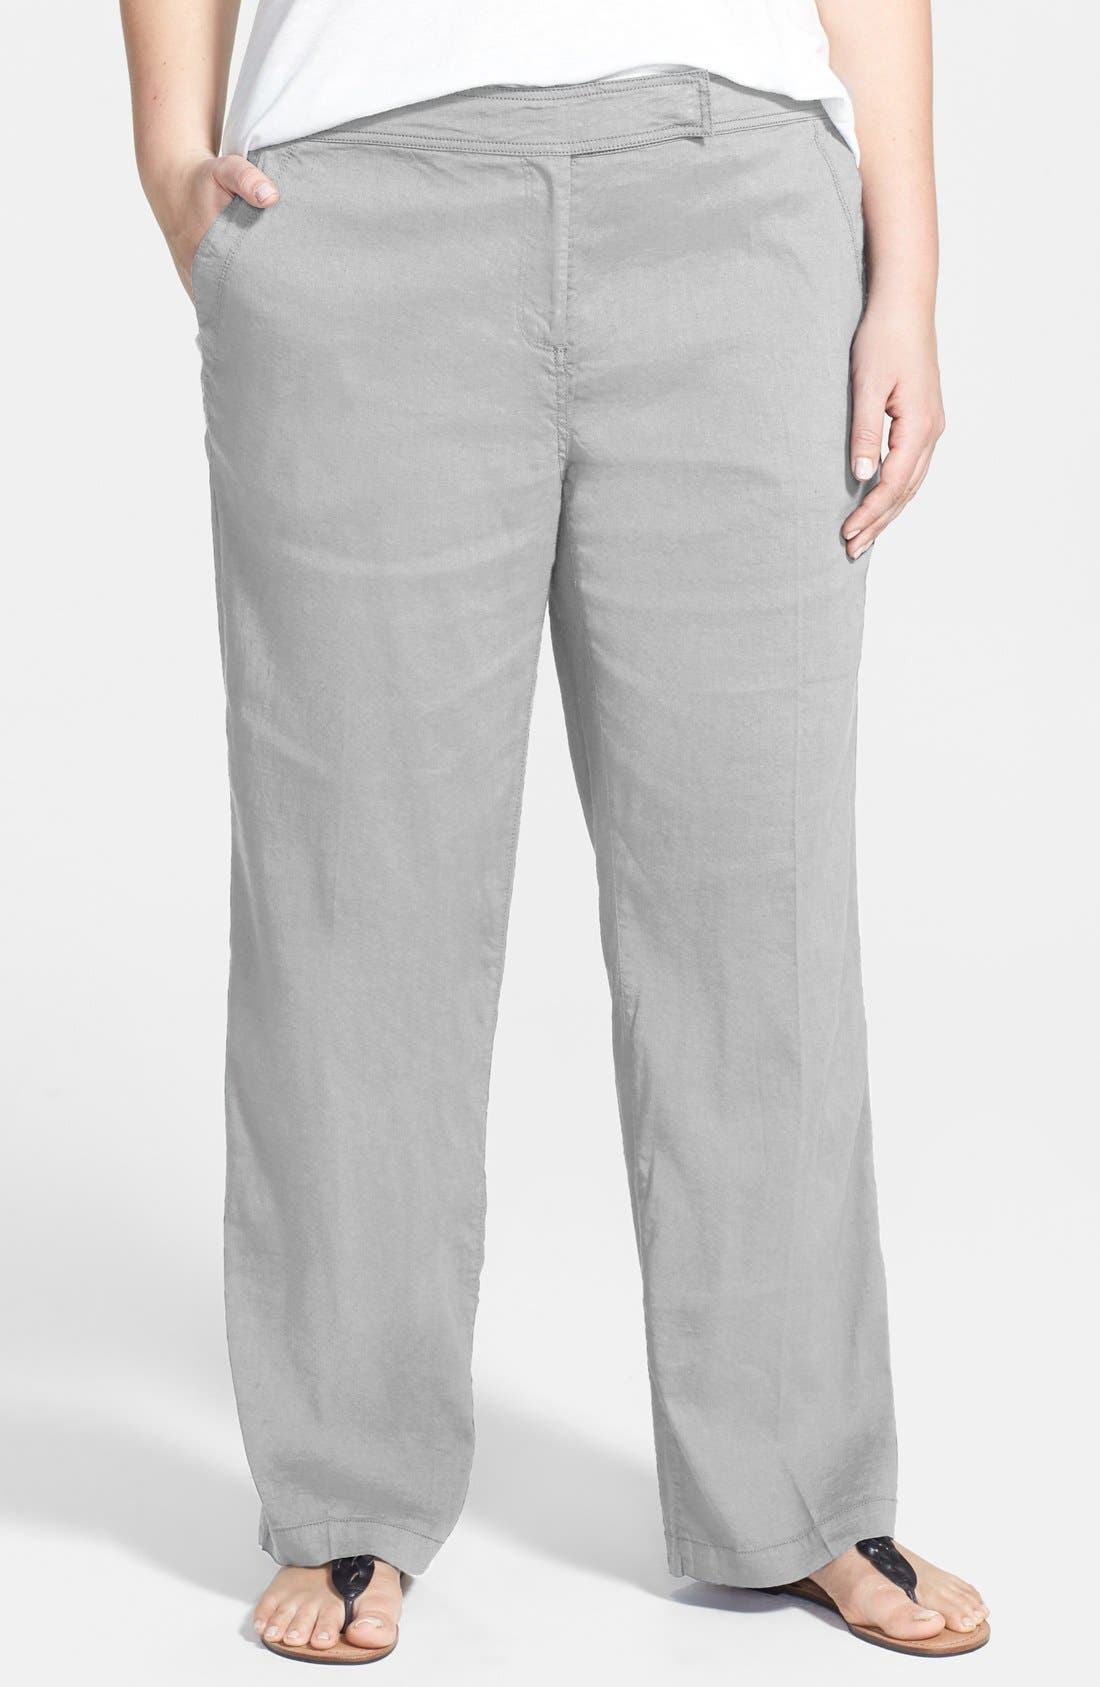 Alternate Image 1 Selected - Eileen Fisher Straight Leg Linen Blend Trousers (Plus Size)